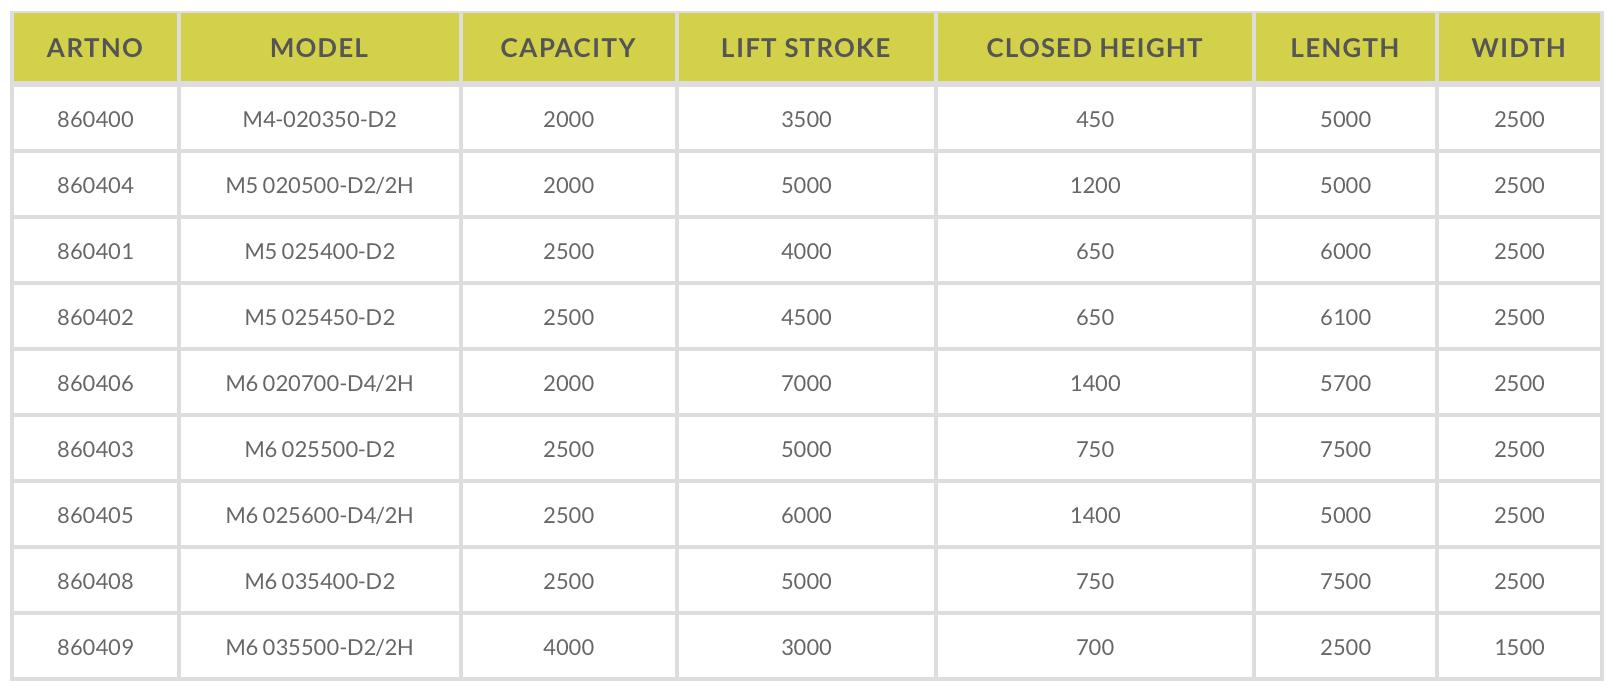 Marco Scissor Lift Car Product Info Table